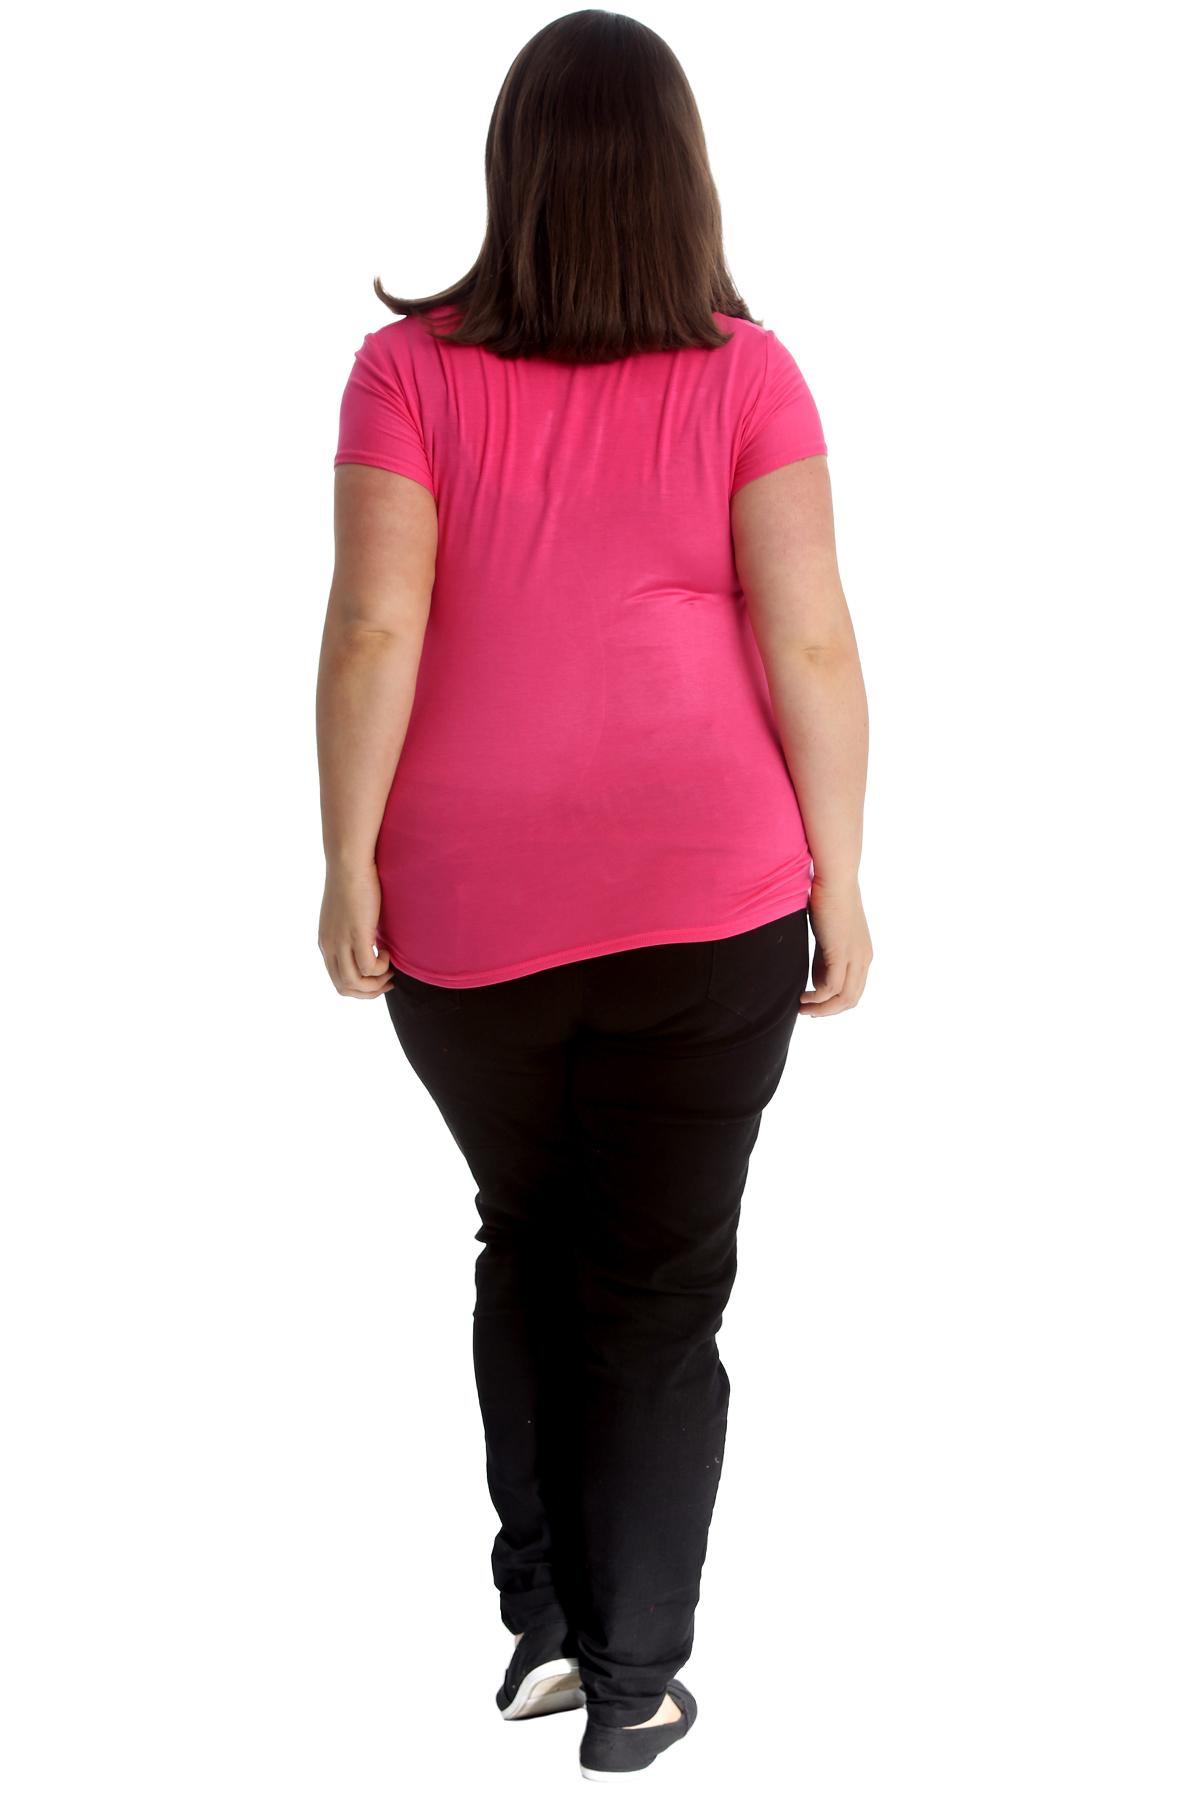 New-Womens-Plus-Size-Top-Ladies-Cherry-Rhinestone-T-Shirt-Soft-Stud-Shiny-Hip thumbnail 22